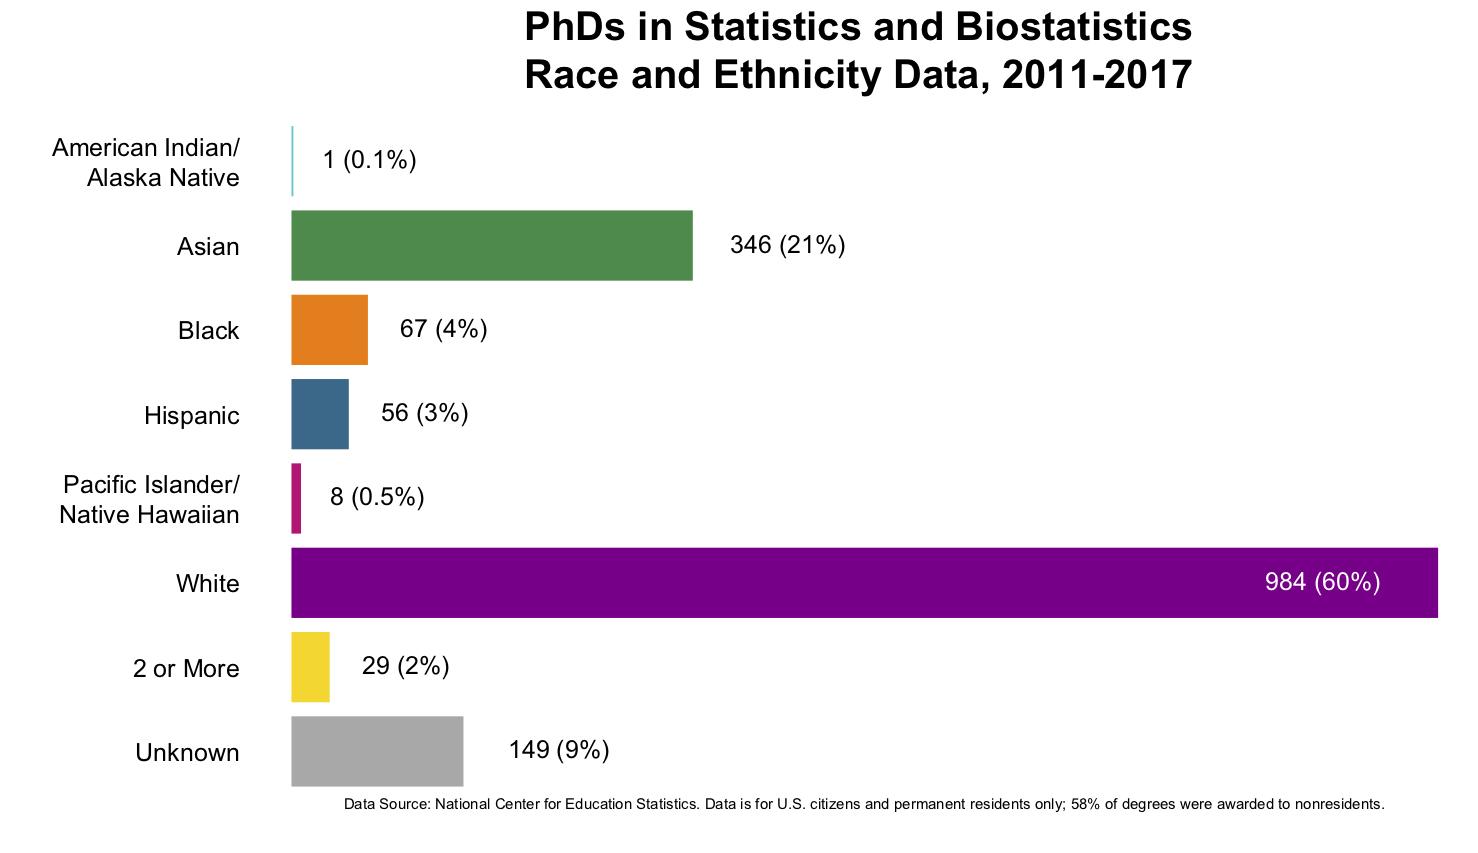 PhDsraceethnicitycopy.jpg